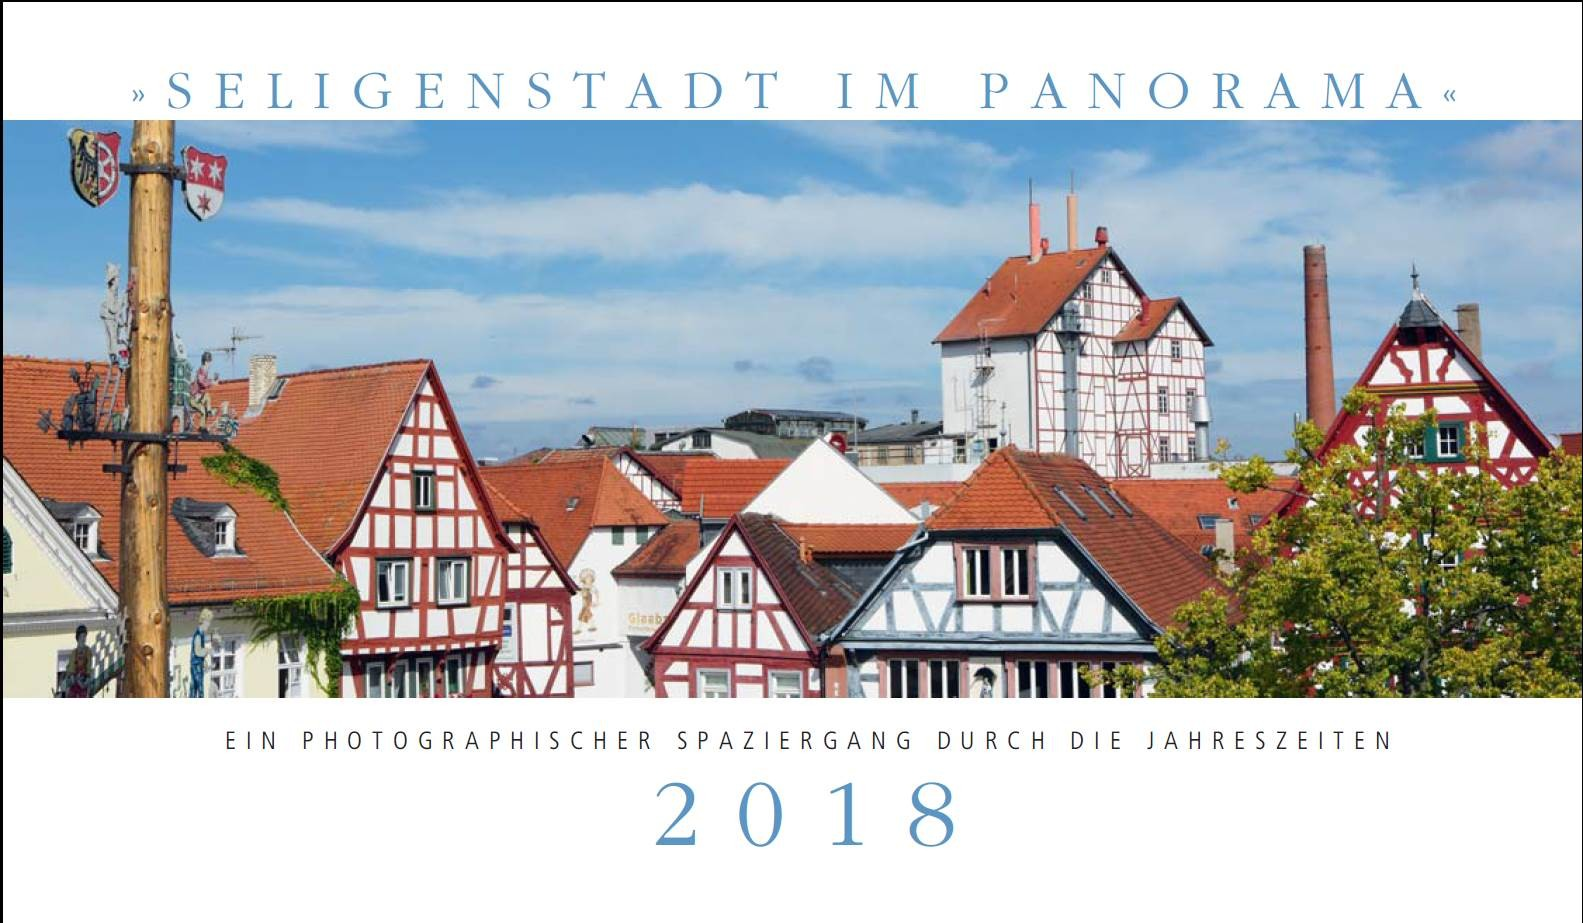 Titelbild des Panorama Kalenders 2018